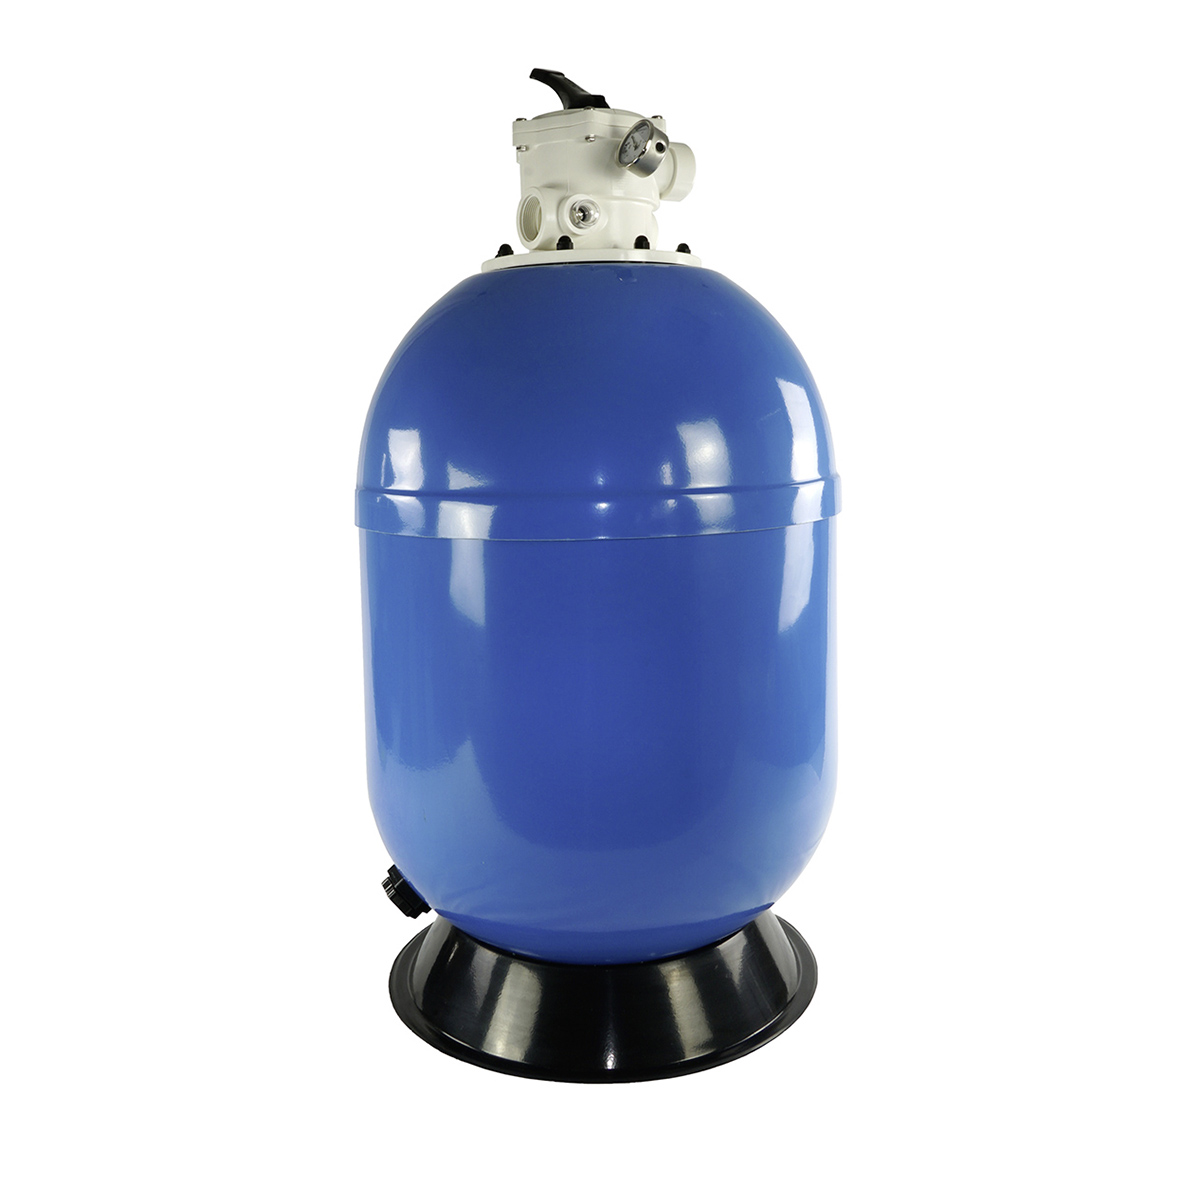 "Polyester Filter VIENNA II, laminiert, top mount, blau, d400, inkl. Manometer, Klemmring und original Praher TM 1 1/2"" 7 Wege Rückspülventil manuell Polyester Filter VIENNA II, laminiert, top mount, blau, d400, inkl. Manometer, Klemmring und original Praher TM 1 1/2"" 7 Wege Rückspülventil manuell"